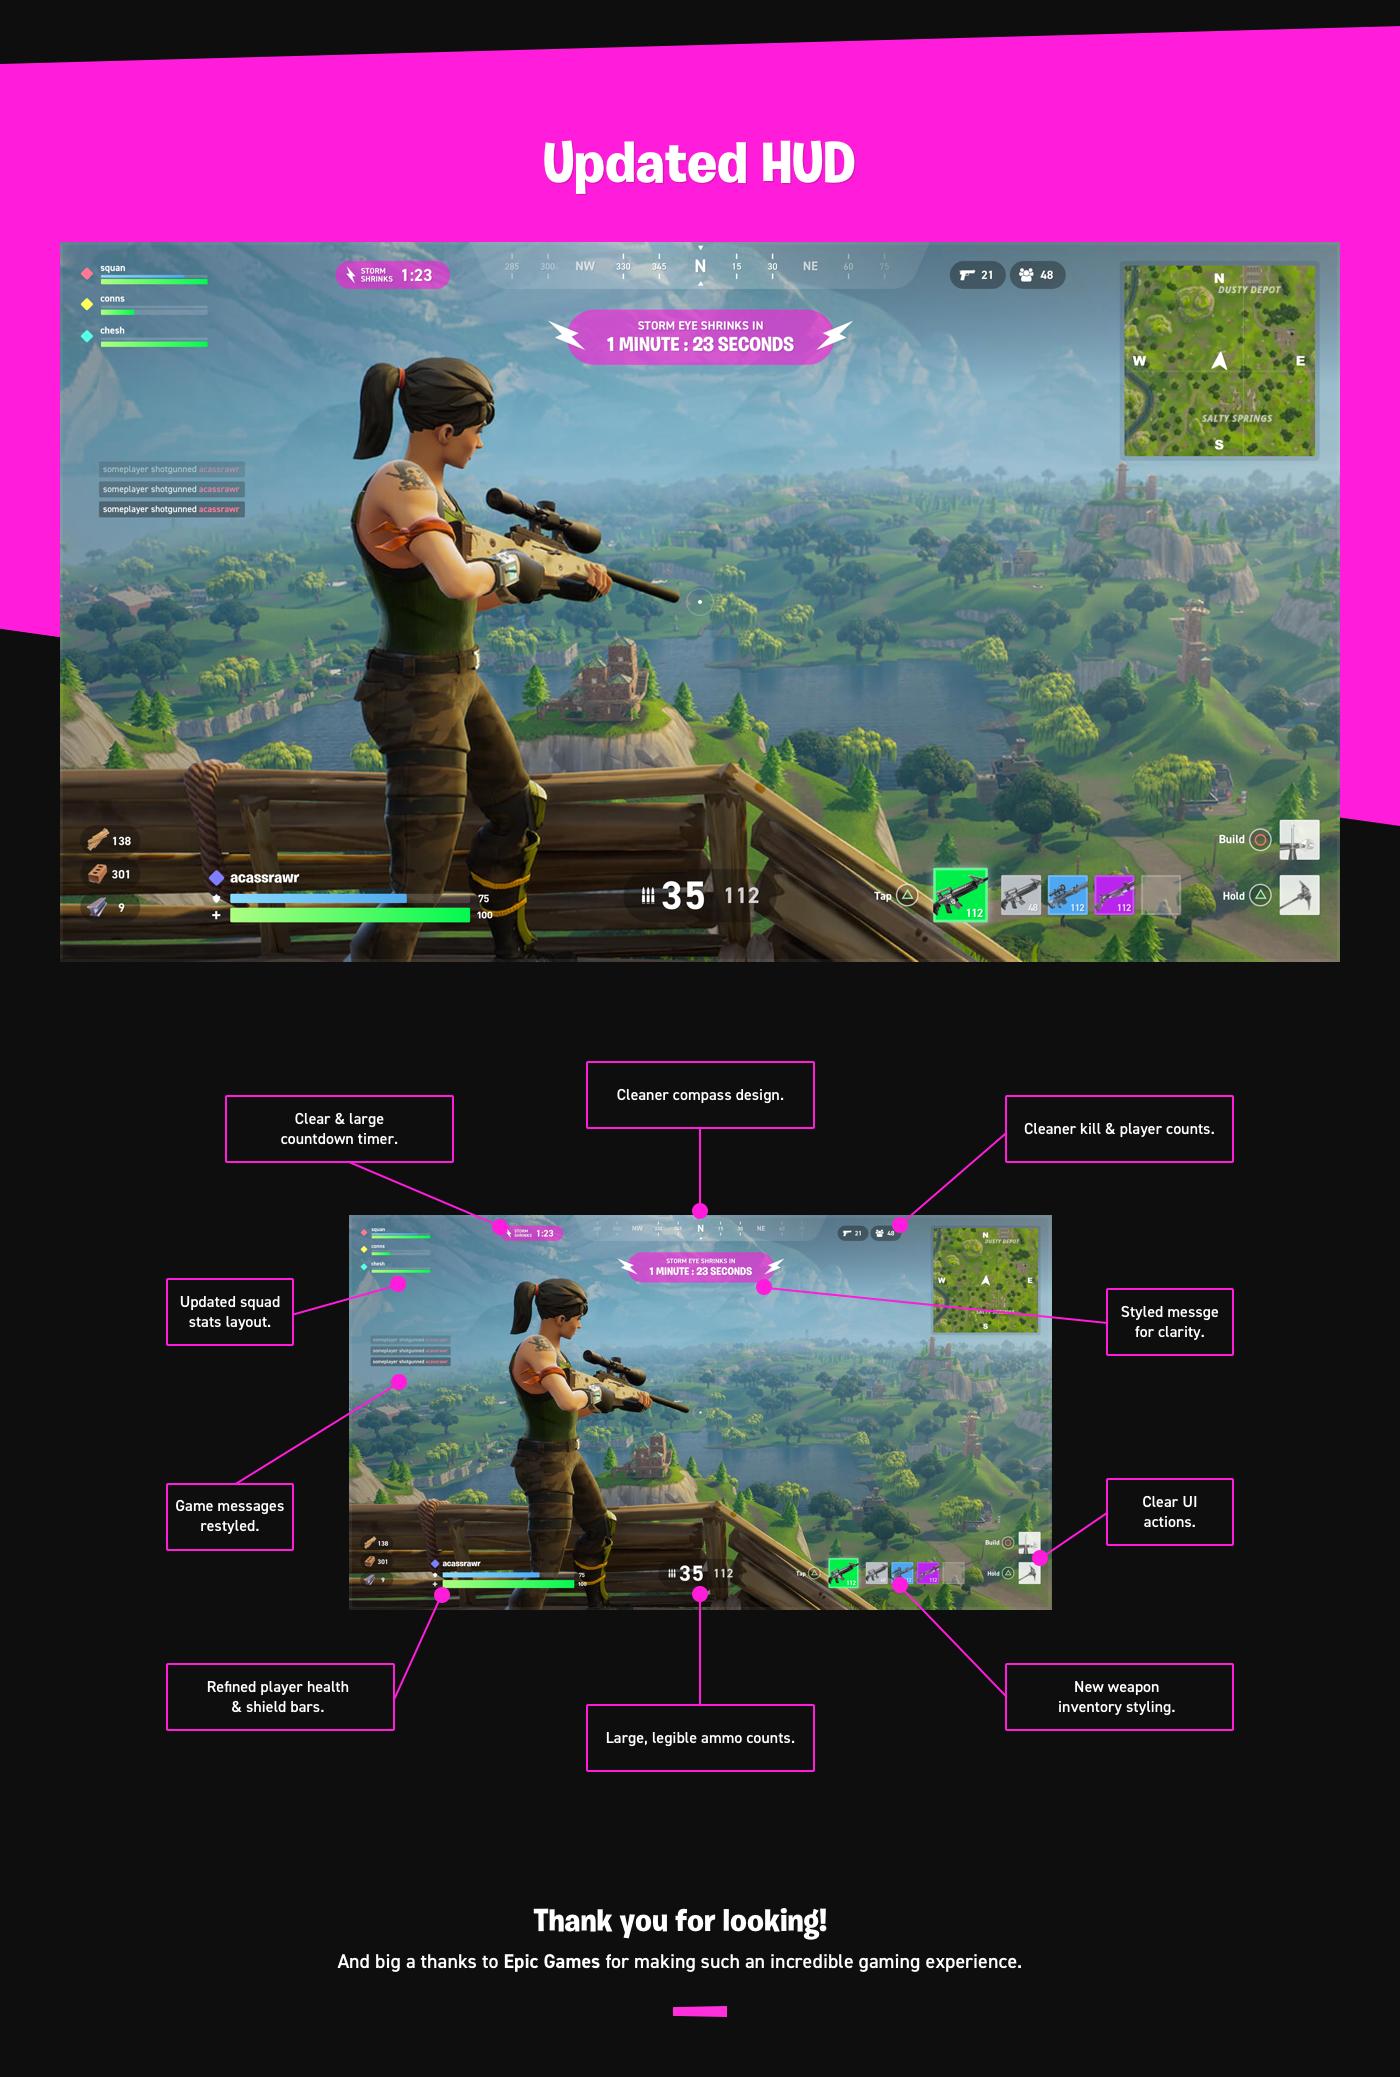 Fortnite Battle Royale PS4 Conceptual HUD Redesign on